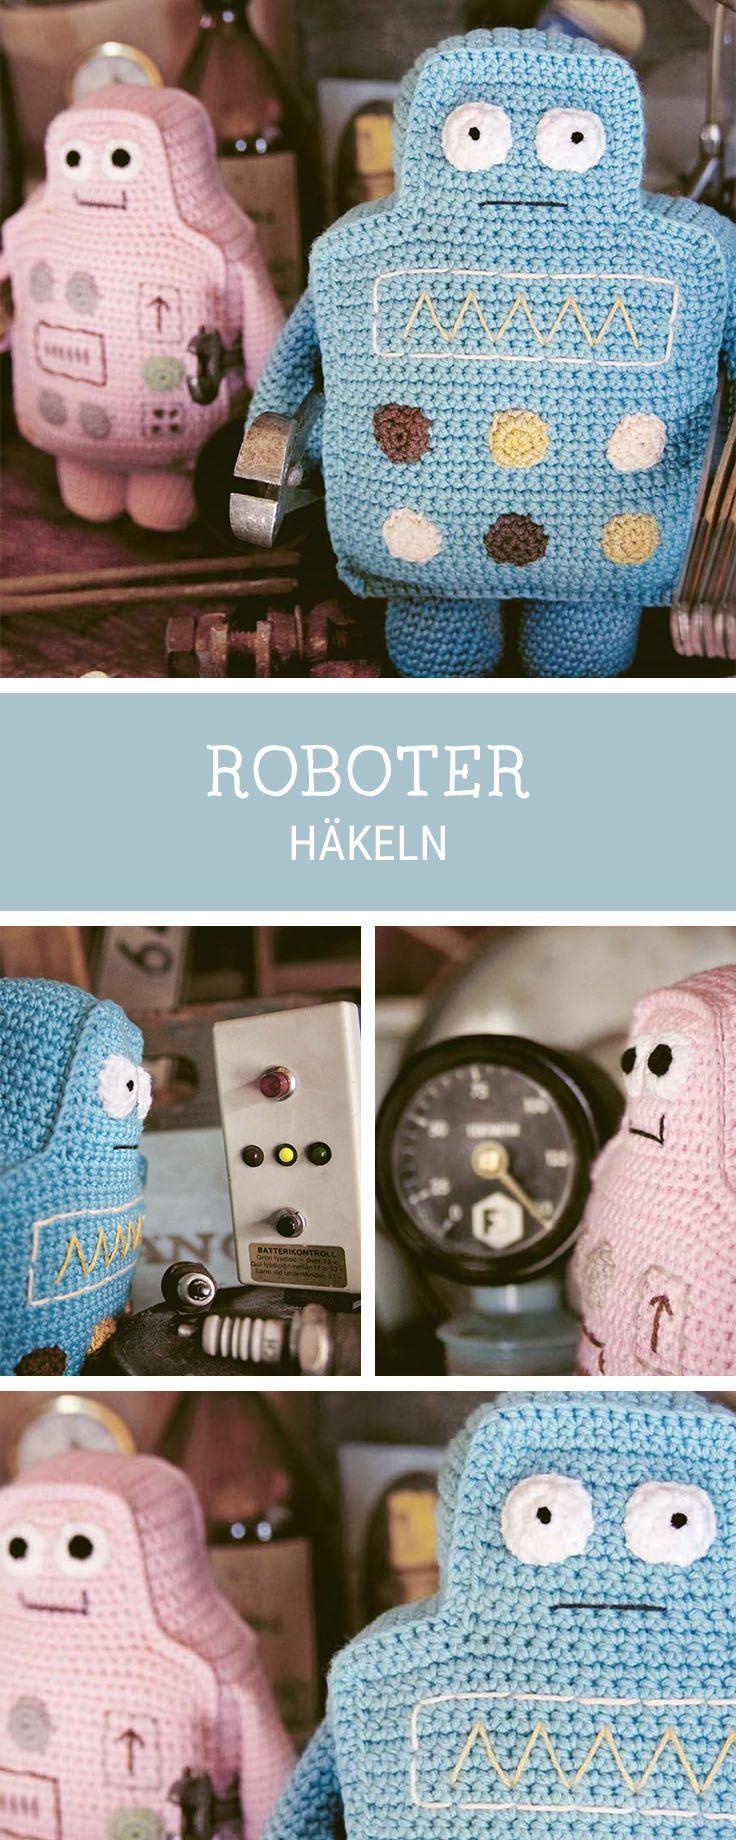 Häkelanleitung: Roboter häkeln / amigurumi pattern for cute robots via DaWanda.com